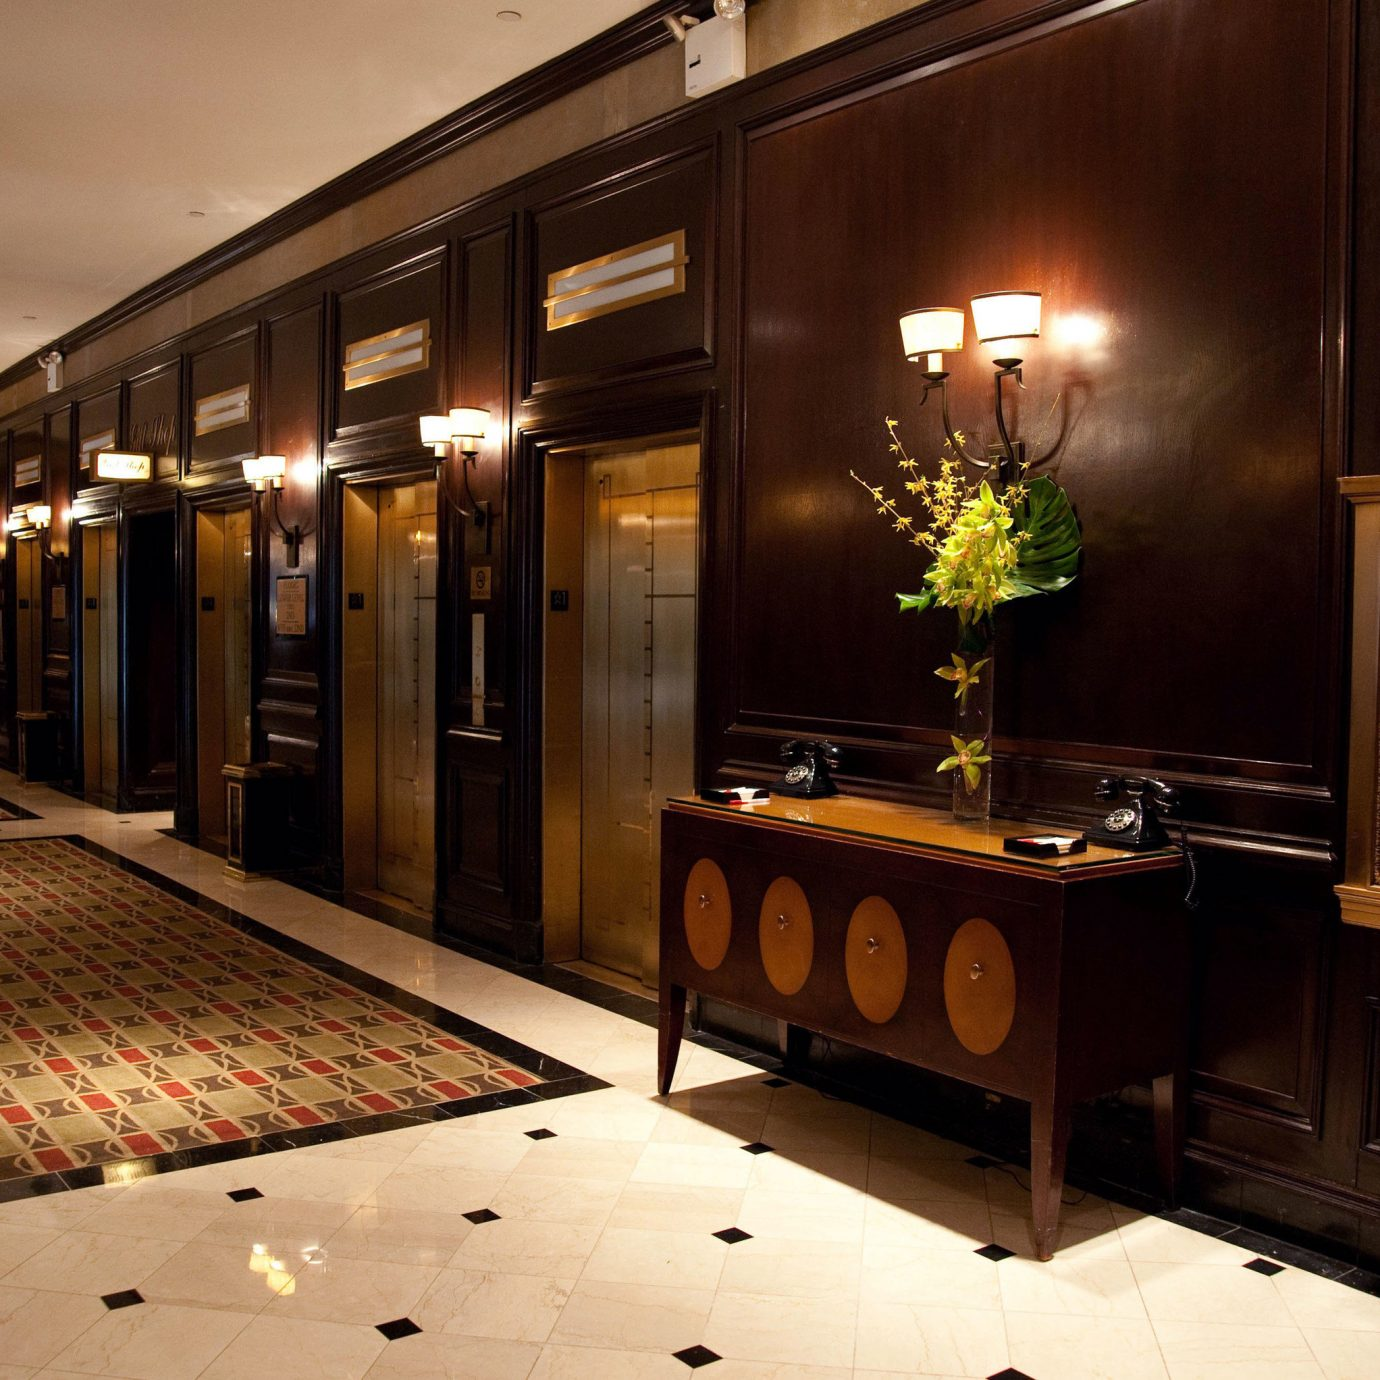 Lobby lighting restaurant Bar night